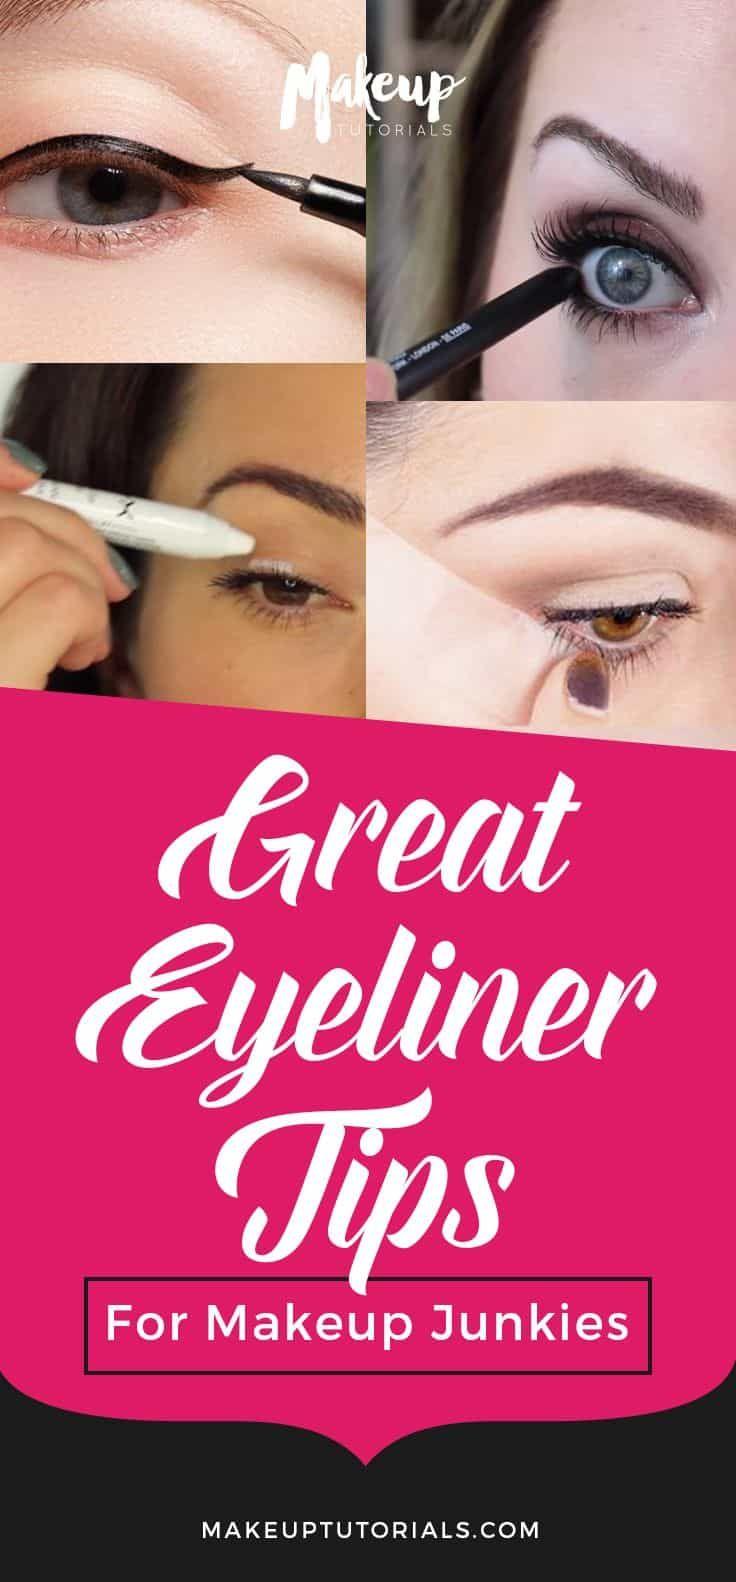 Eyeliner tips   Great Eyeliner Tips For Makeup Junkies